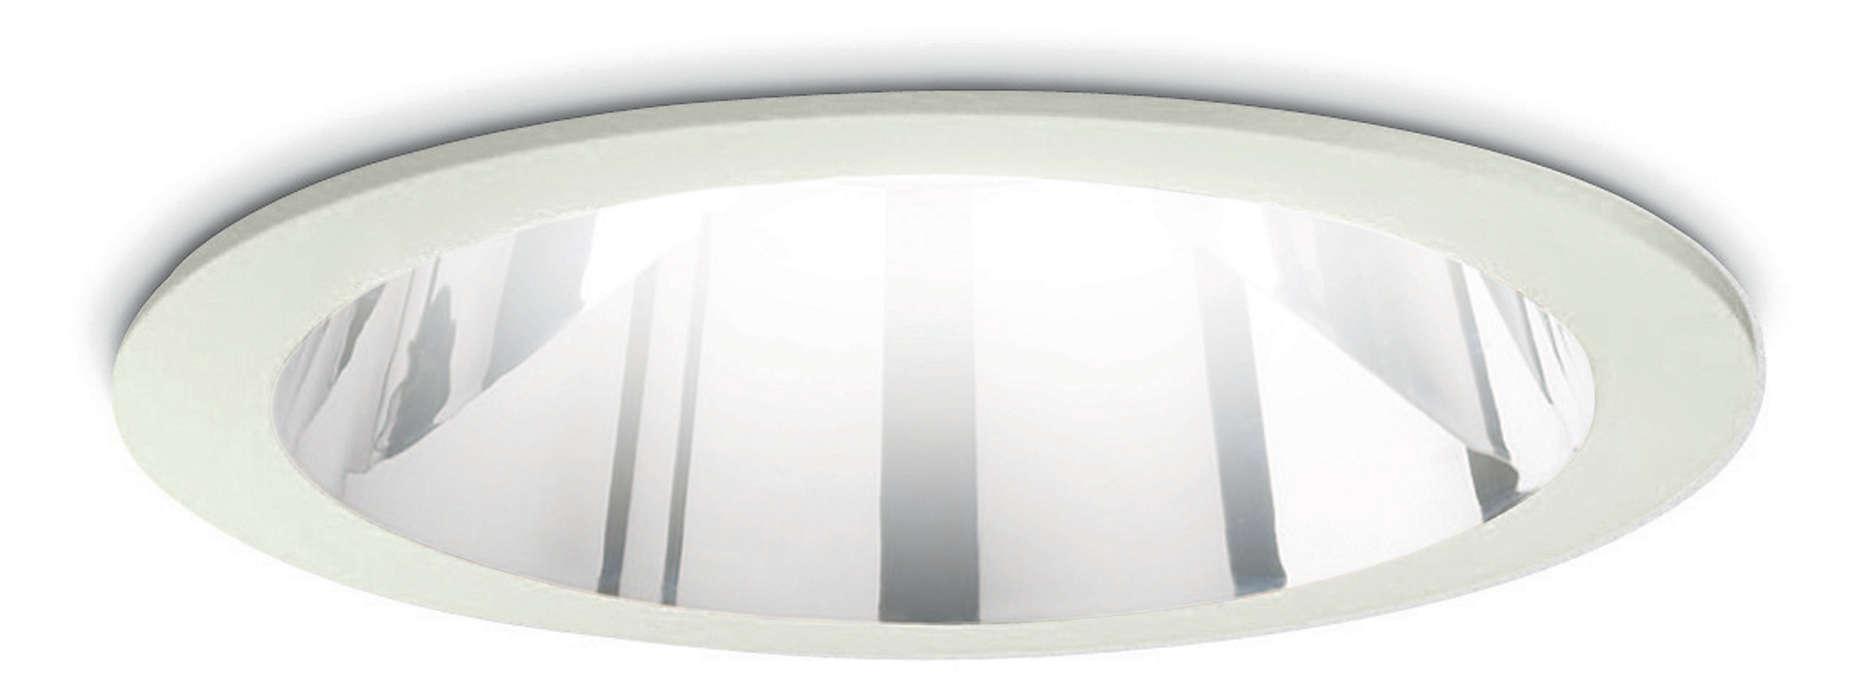 Fugato Performance, general lighting